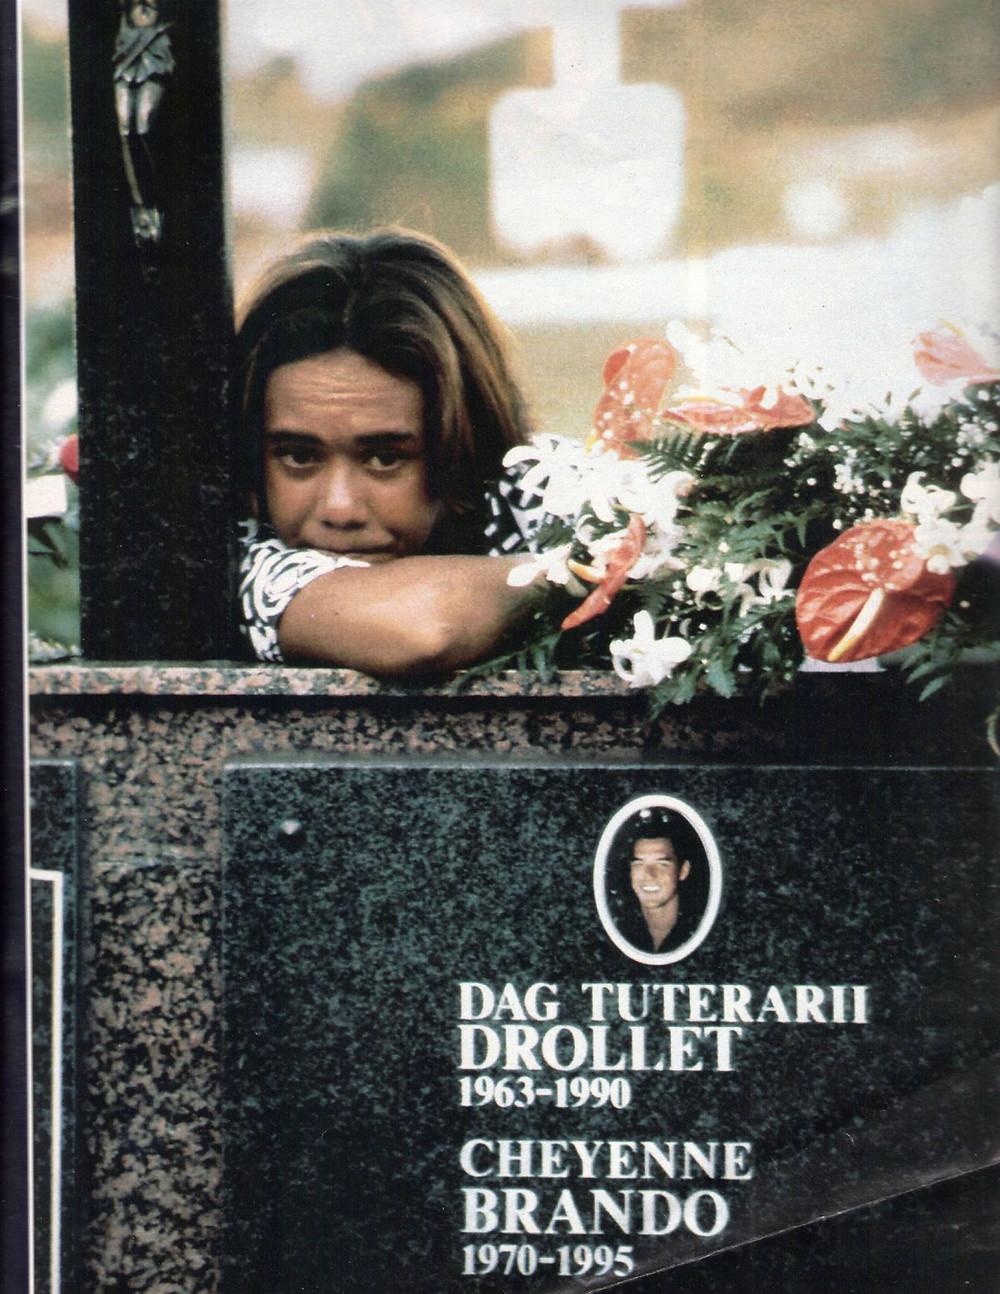 Cheyenne Brando Funeral Tuki Drollet